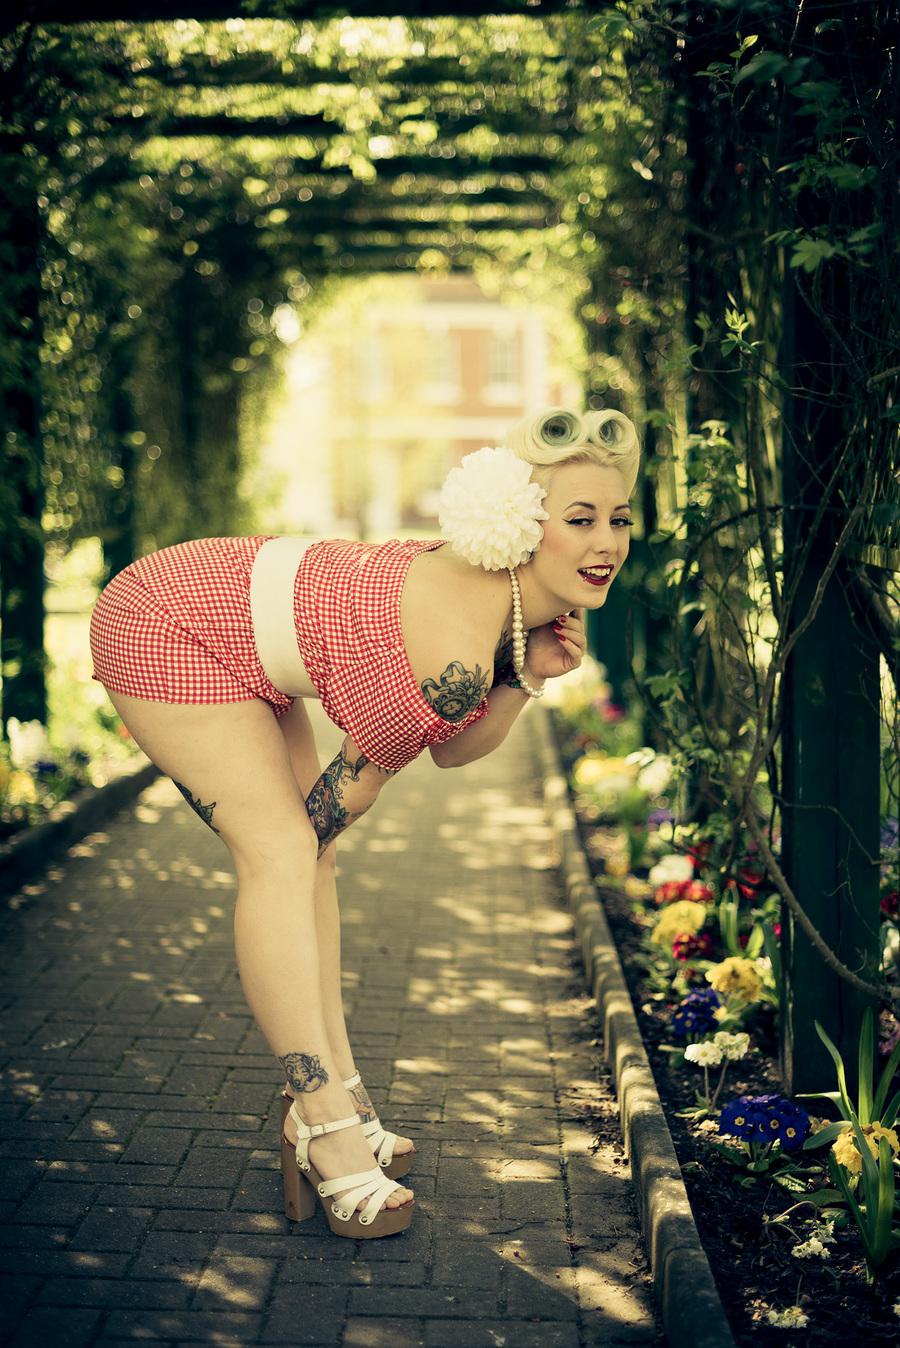 Spring time love / Photography by Lukasz Kapuscinski, Model Millie Jean, Makeup by Millie Jean, Stylist Millie Jean, Hair styling by Millie Jean / Uploaded 16th September 2017 @ 09:10 PM